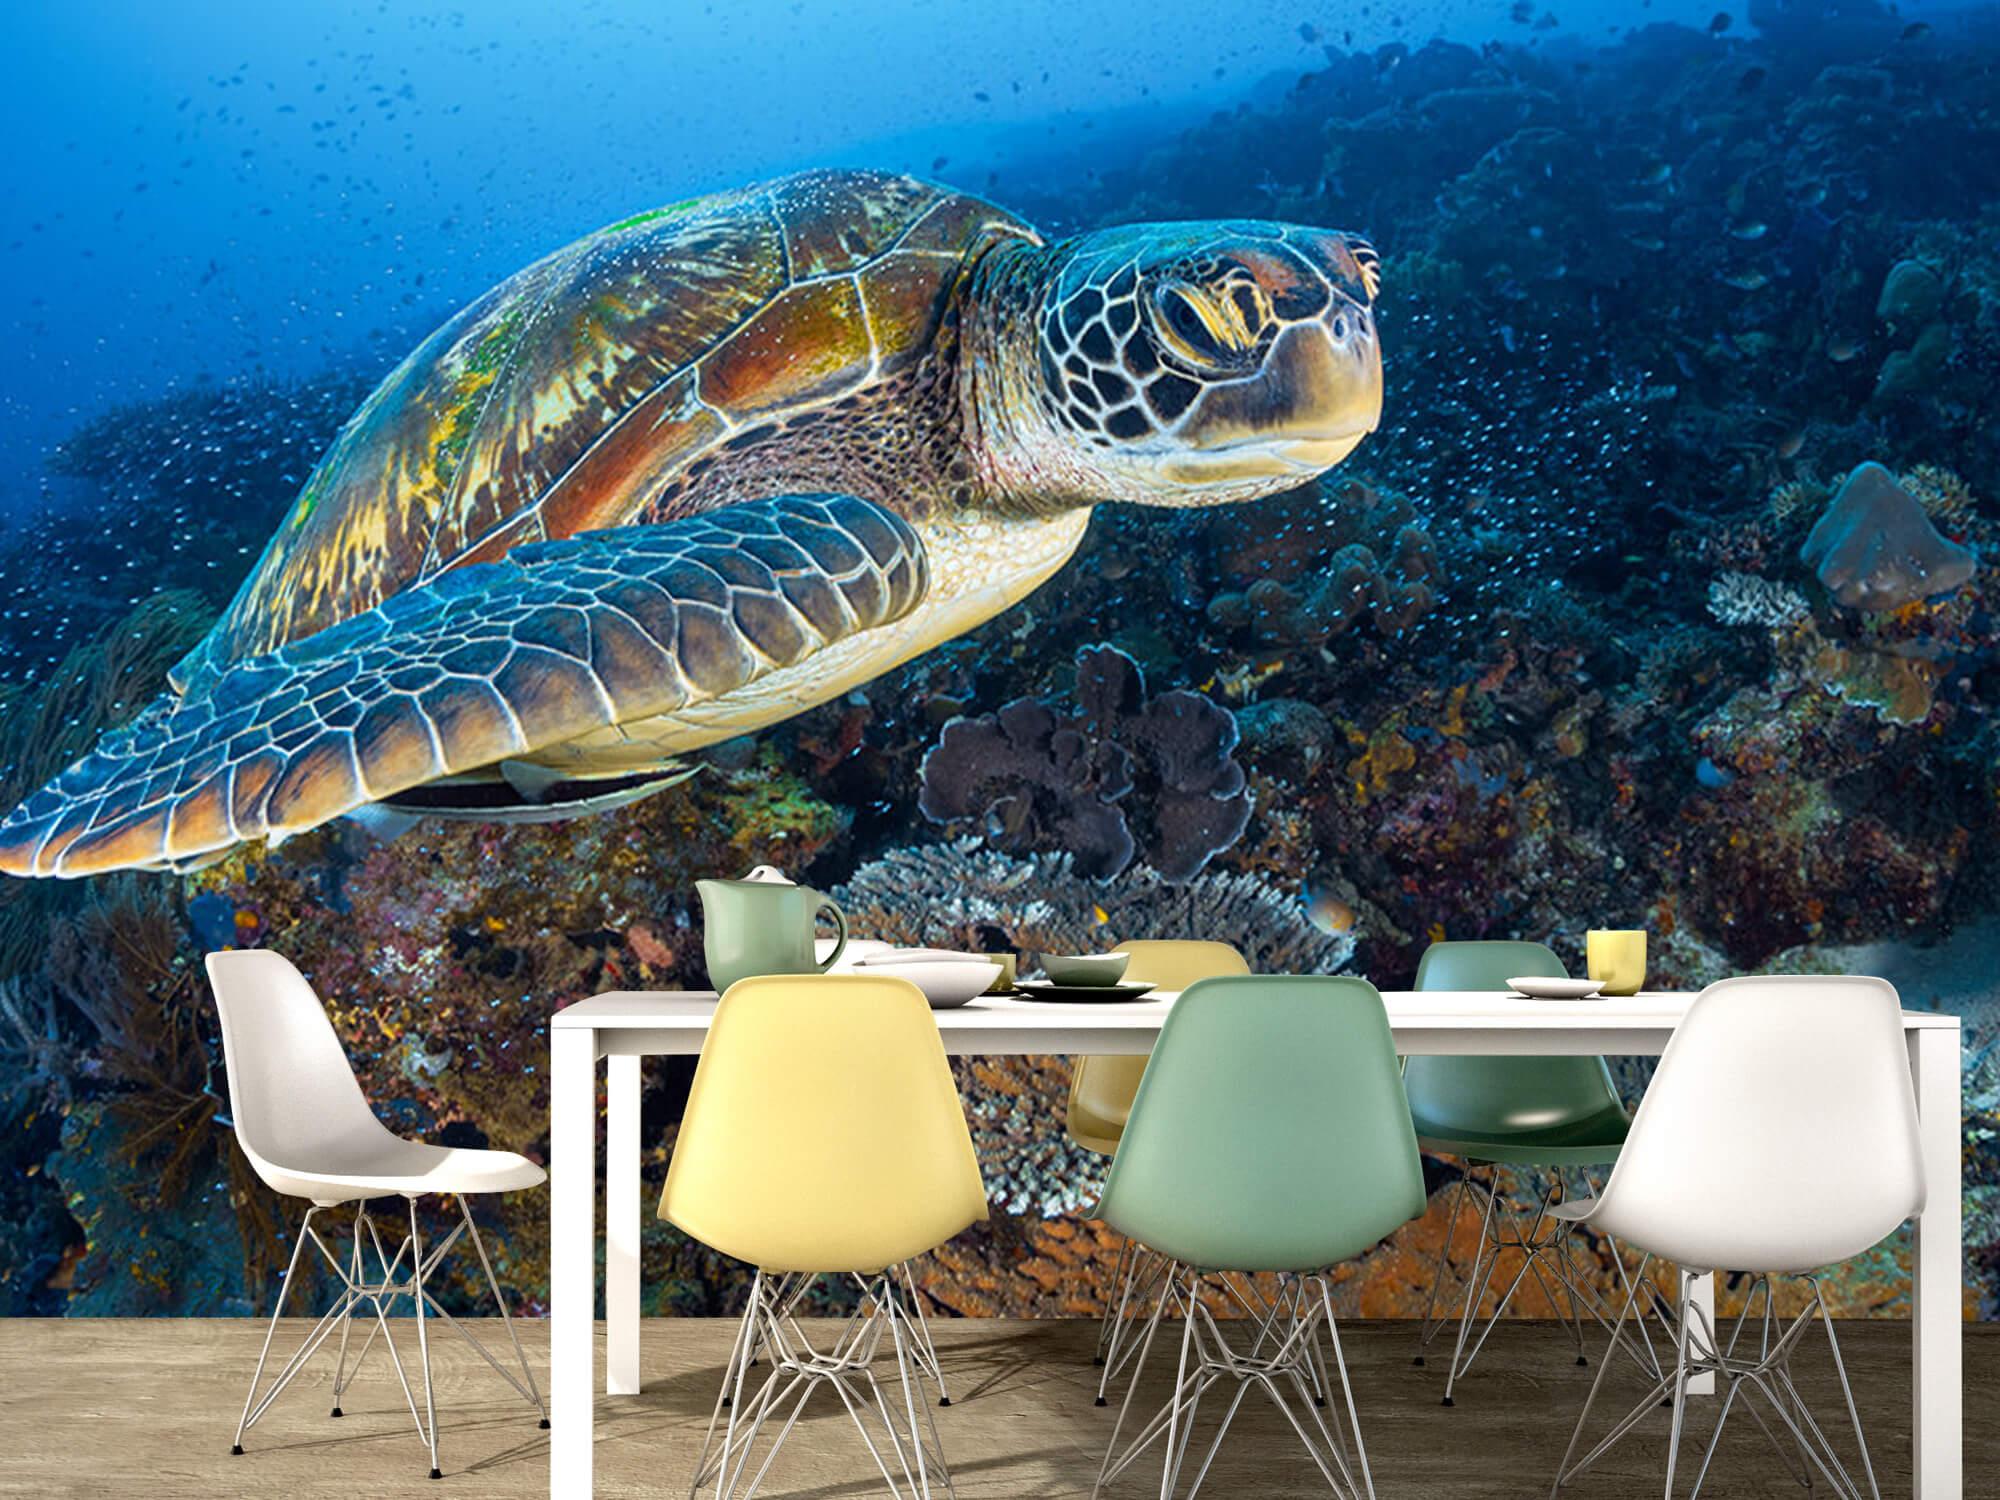 Green sea turtle from Raja Ampat 16